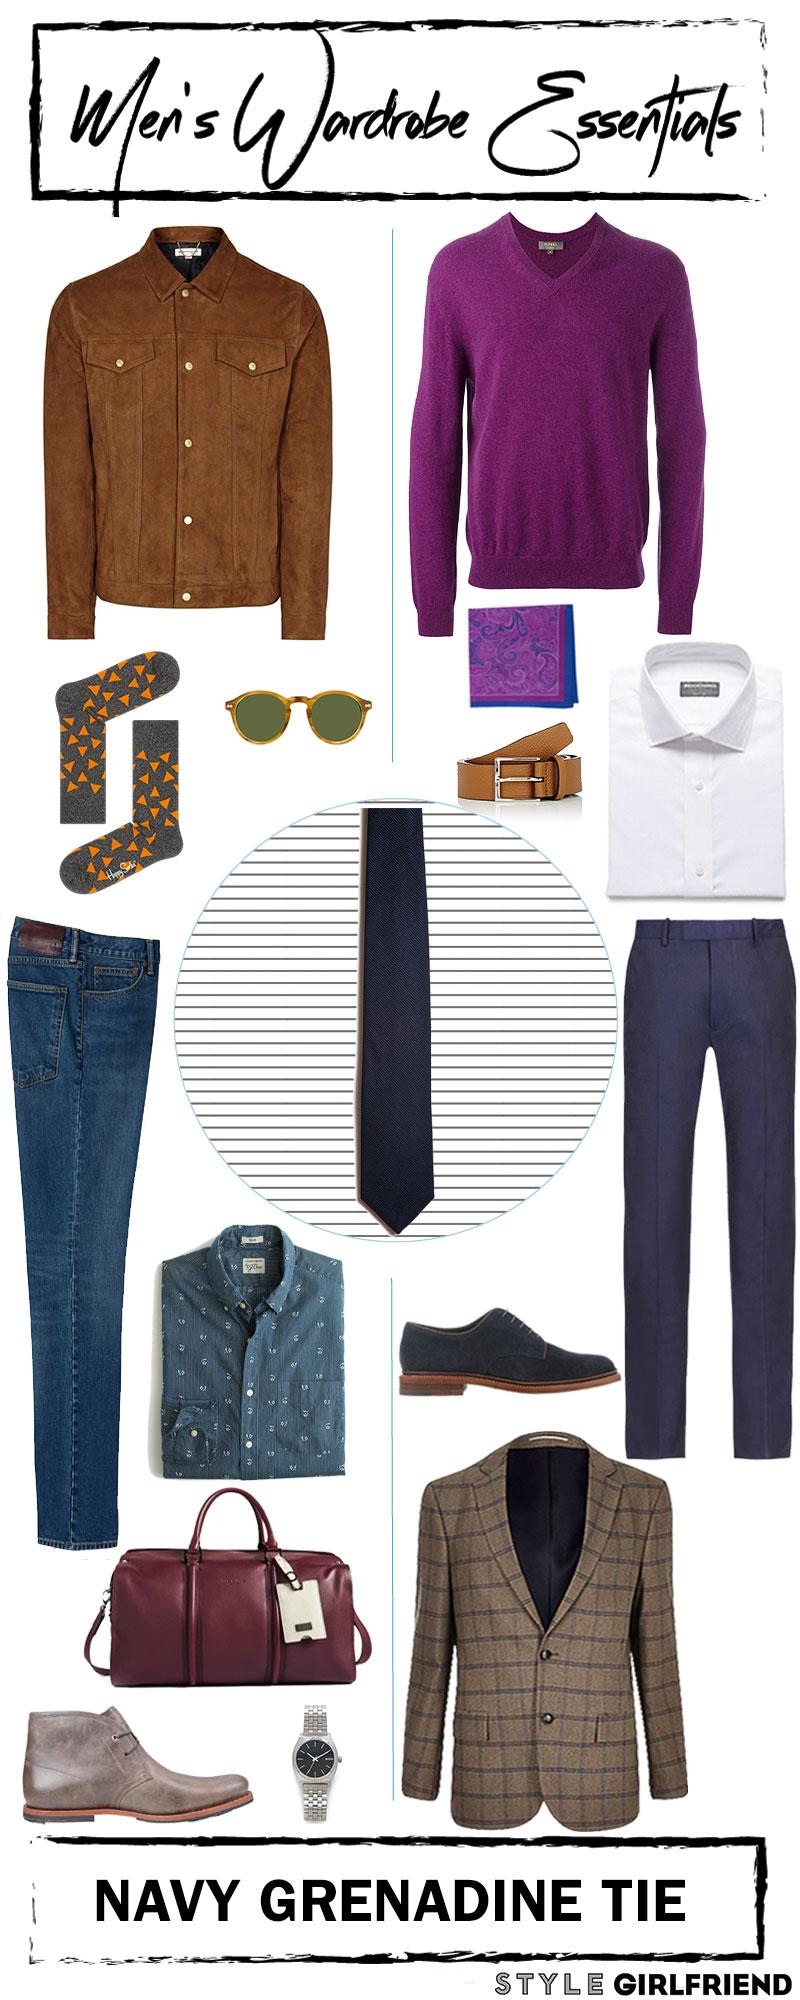 mens wardrobe essential, navy geraldine tie, style girlfriend, mens outfit laydown,